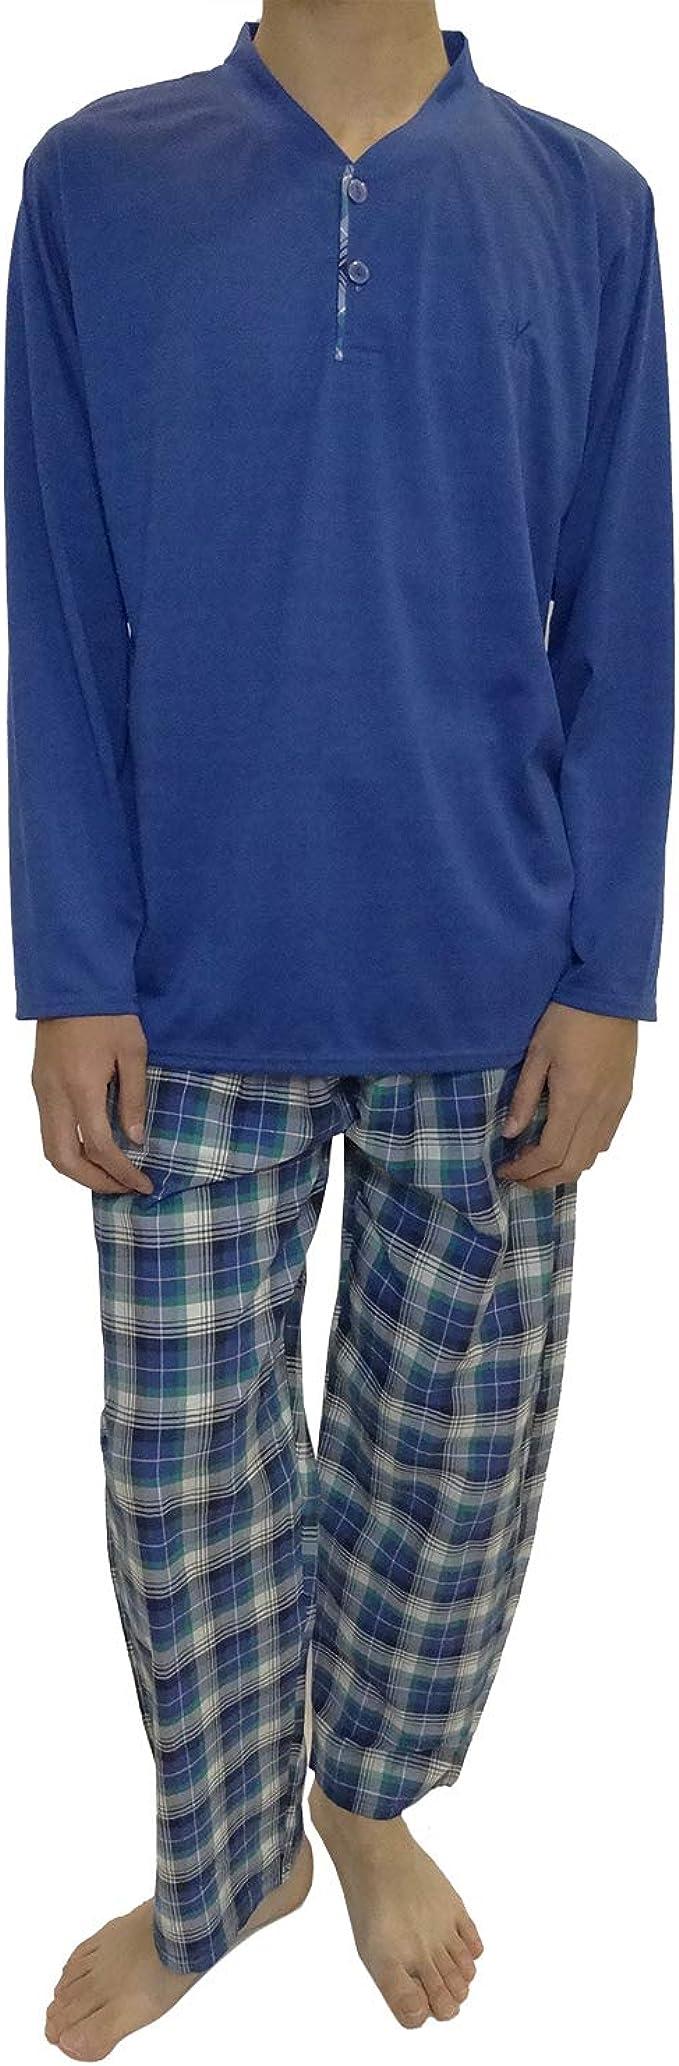 Mini kitten - Pijama de Caballero Hombre de Algodon Fino Manga Larga con Pantalon 100% Algodon/Ropa para Dormir de Hombre: Amazon.es: Ropa y accesorios